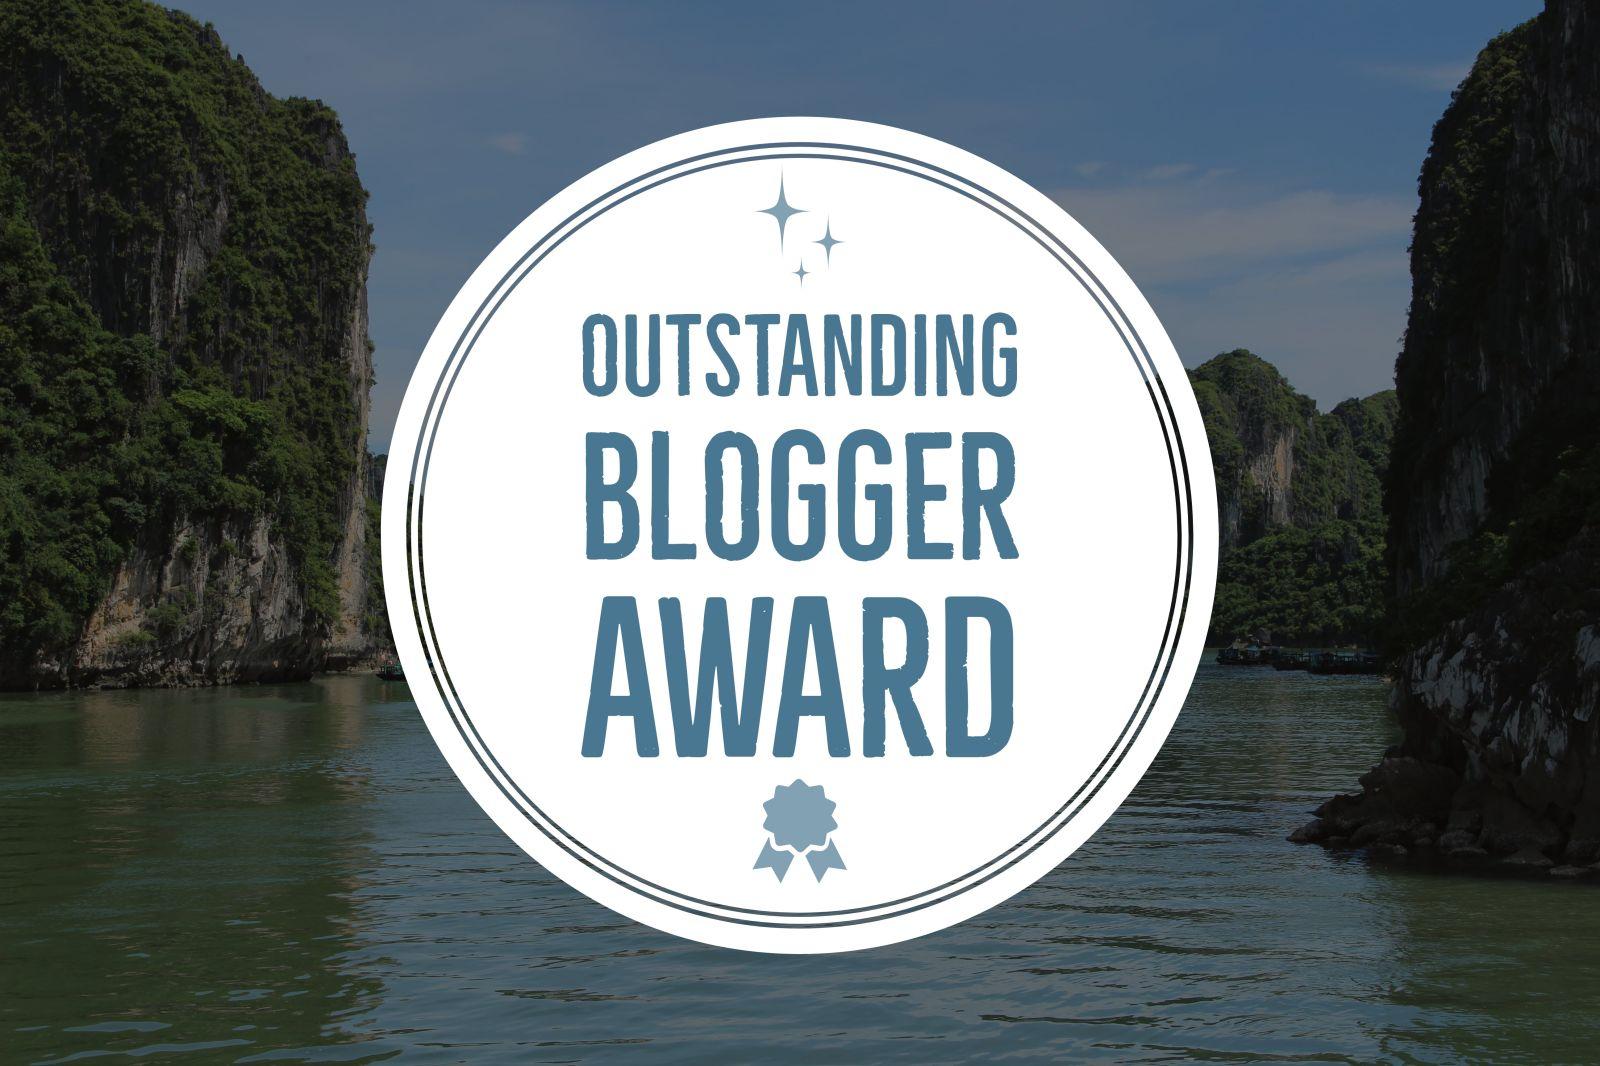 The Outstanding Blogger Award Leighton Travels